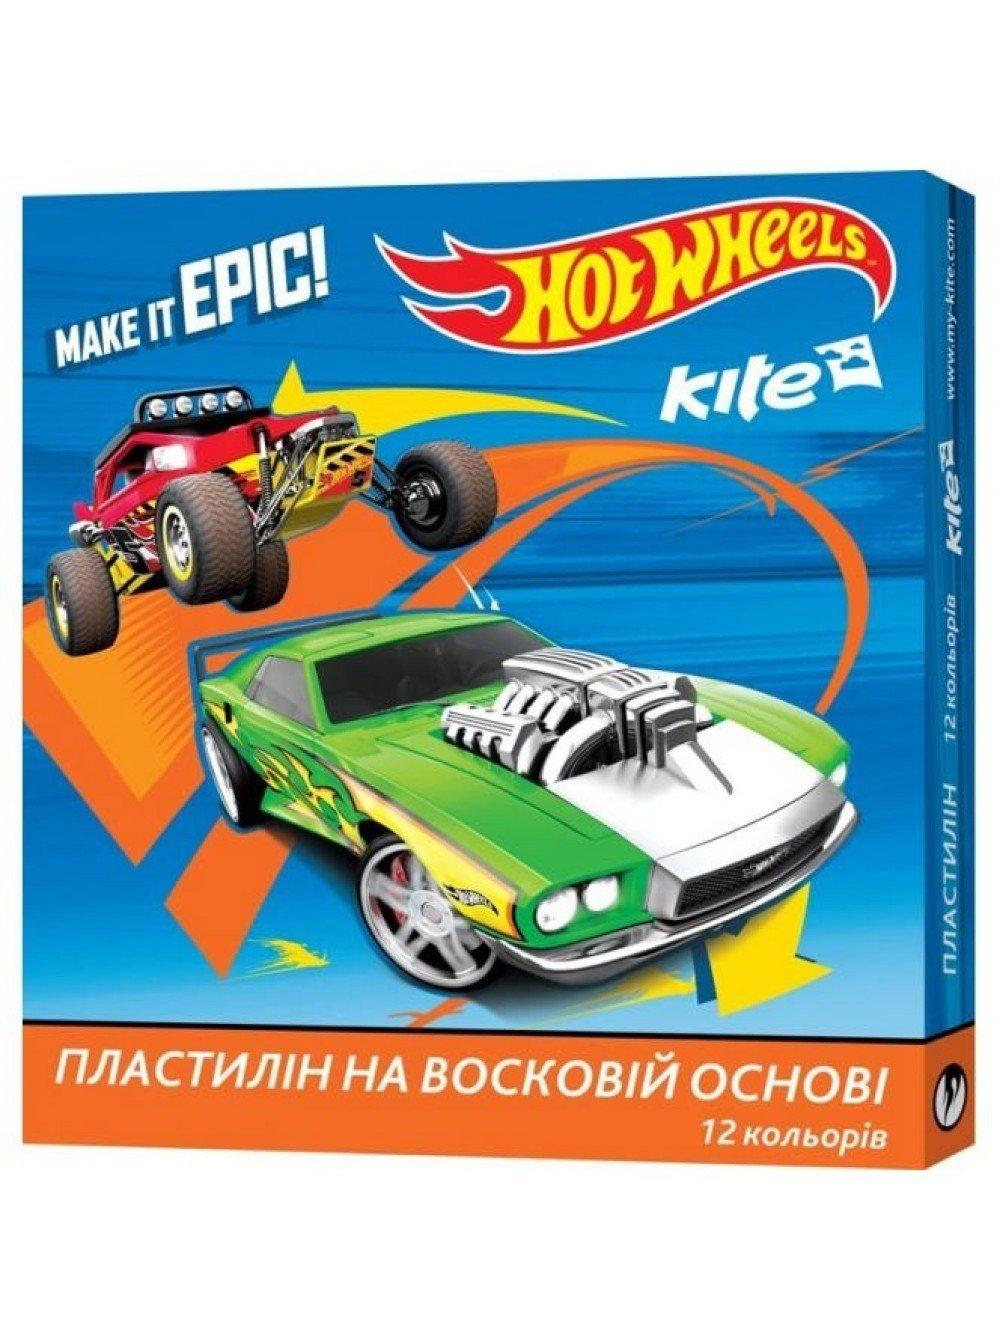 Пластилин восковый Kite Hot Wheels 12 цветов 240г (HW17-1086) фото 1 6fca2191cfc92